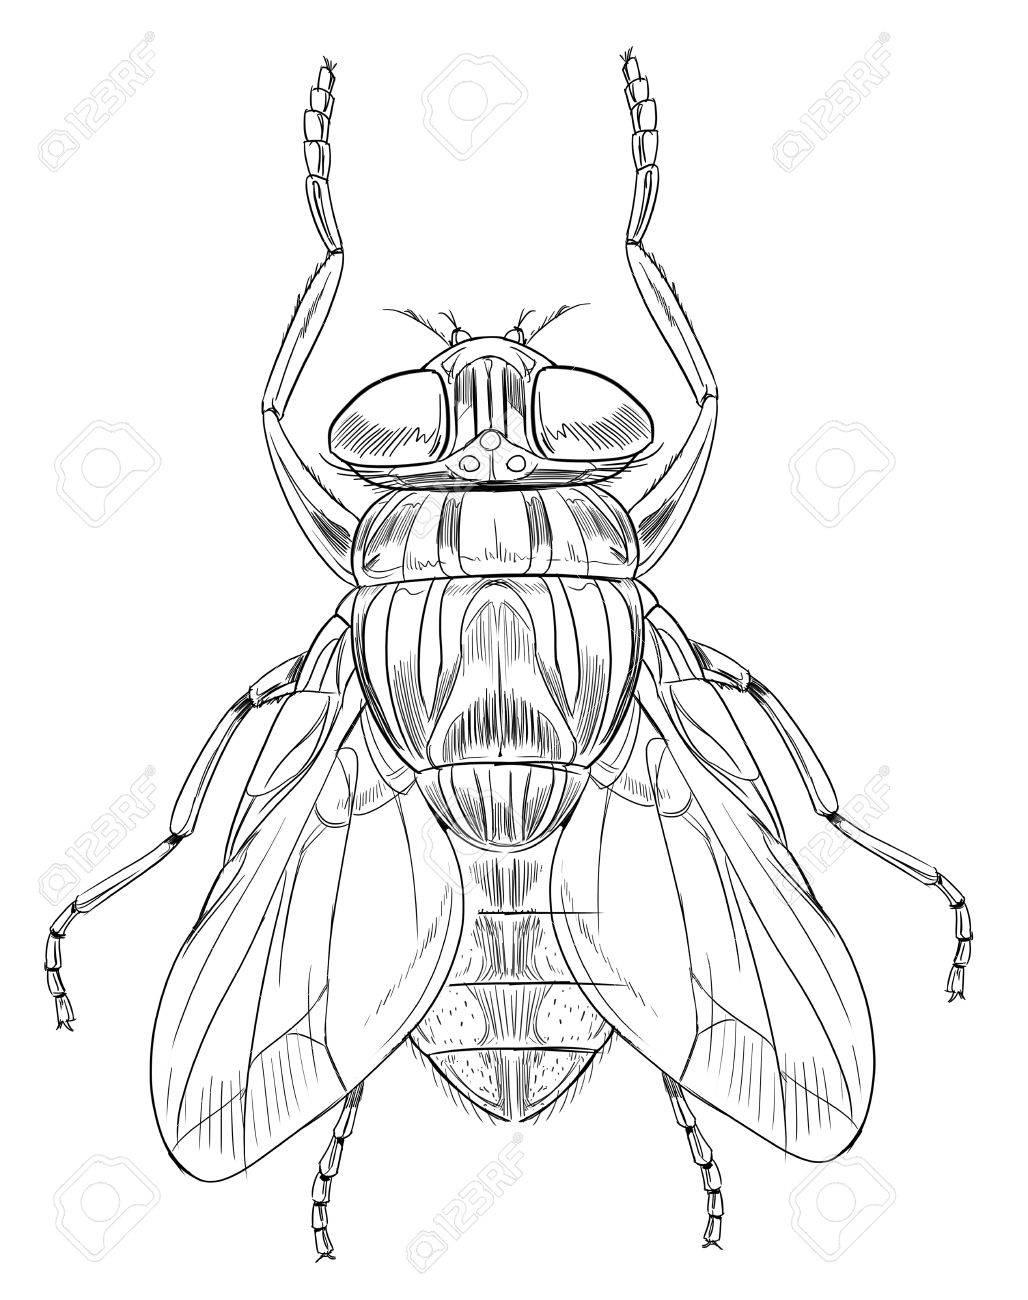 Common housefly - Musca domestica Stock Vector - 16771565